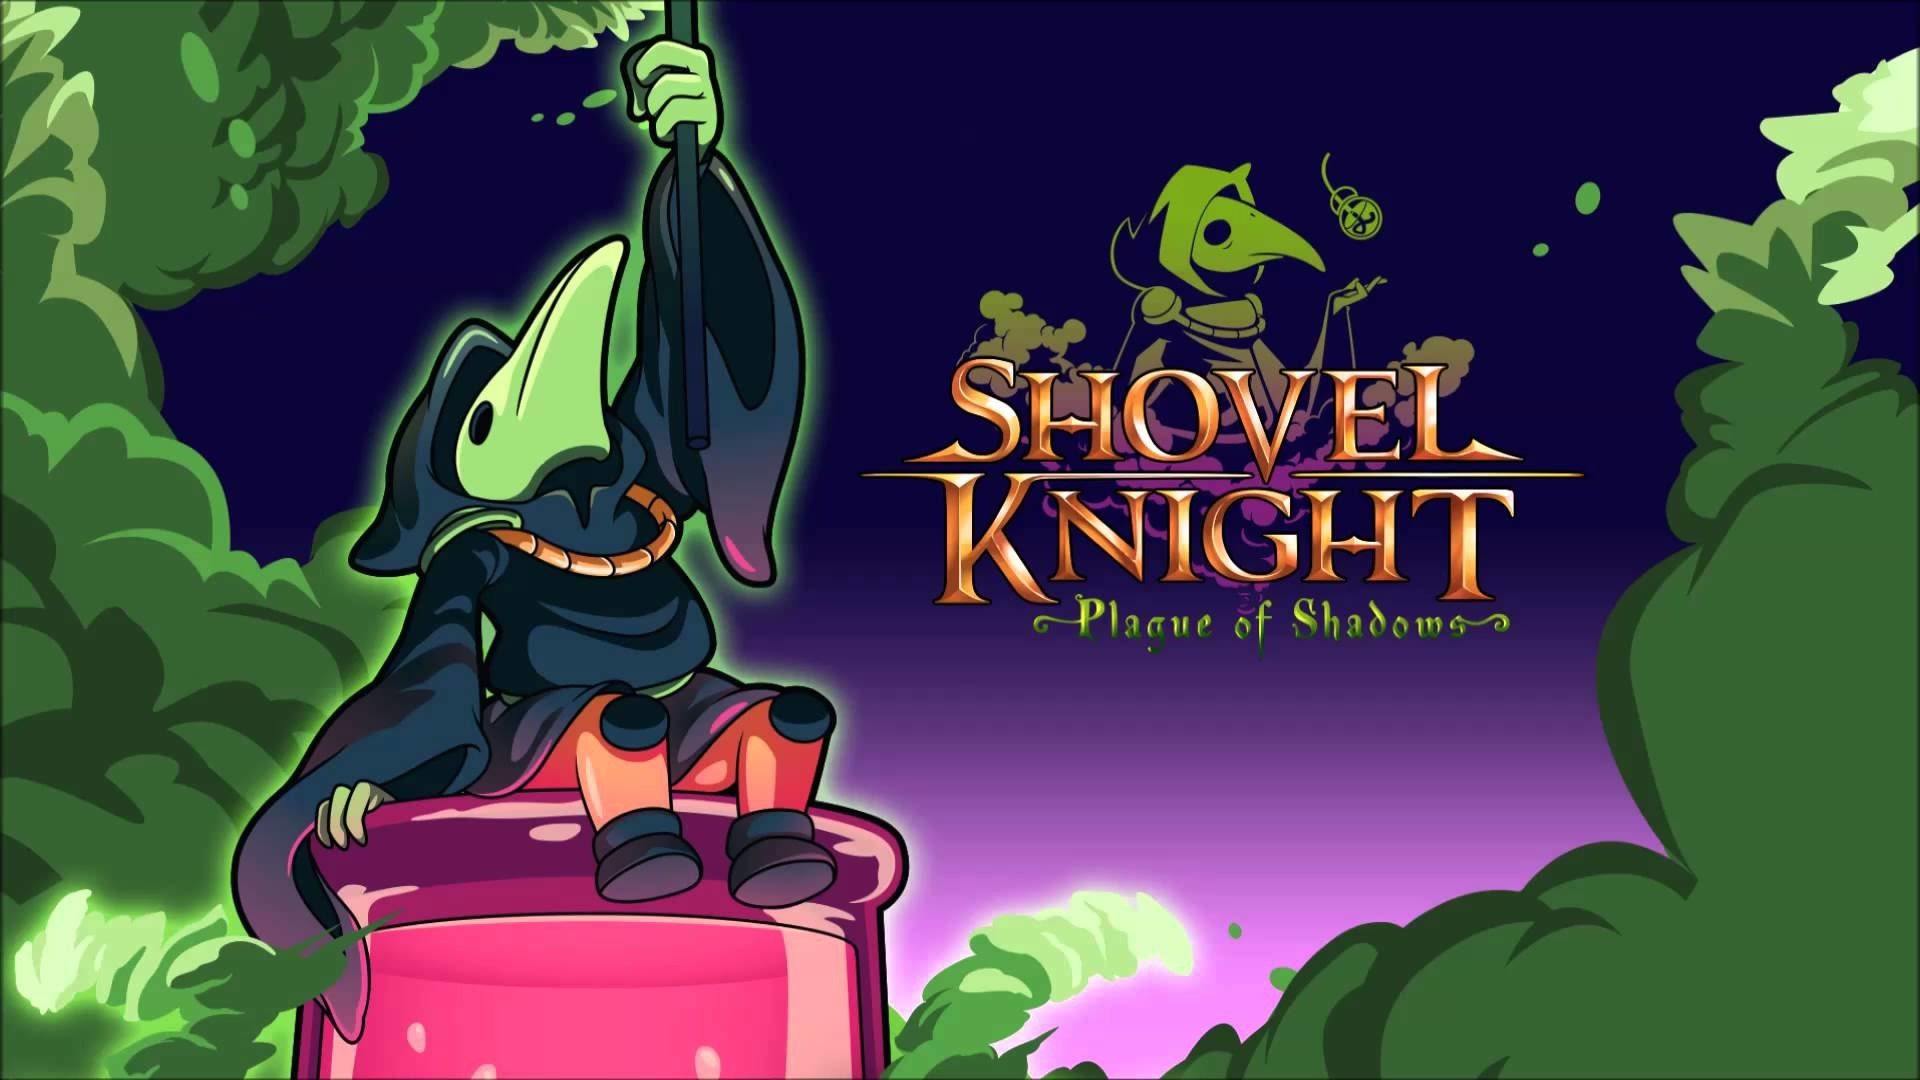 Shovel Knight Wallpaper Hd 89 Images